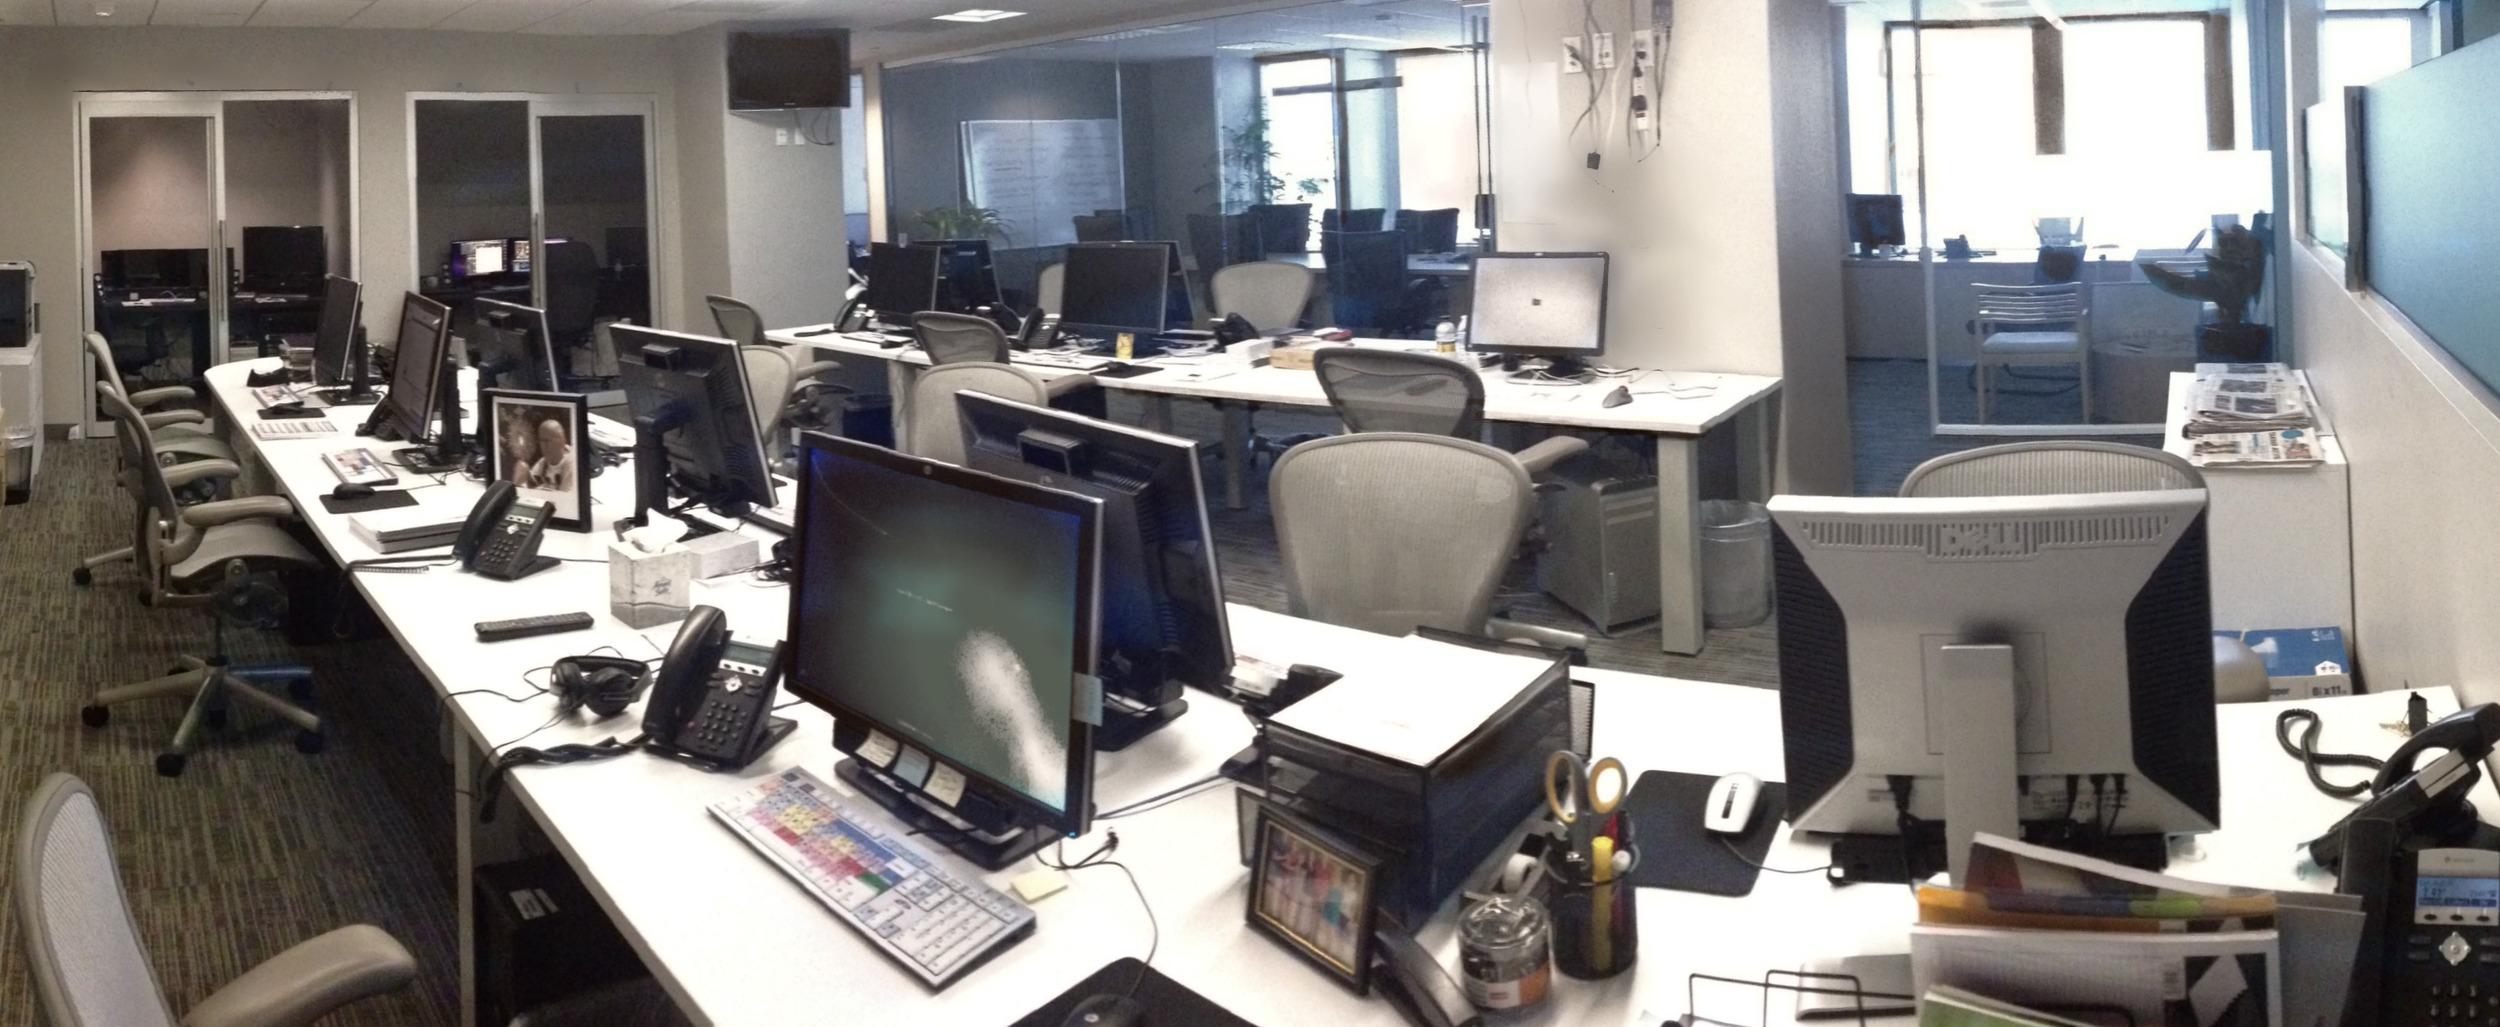 ewtn office.jpg